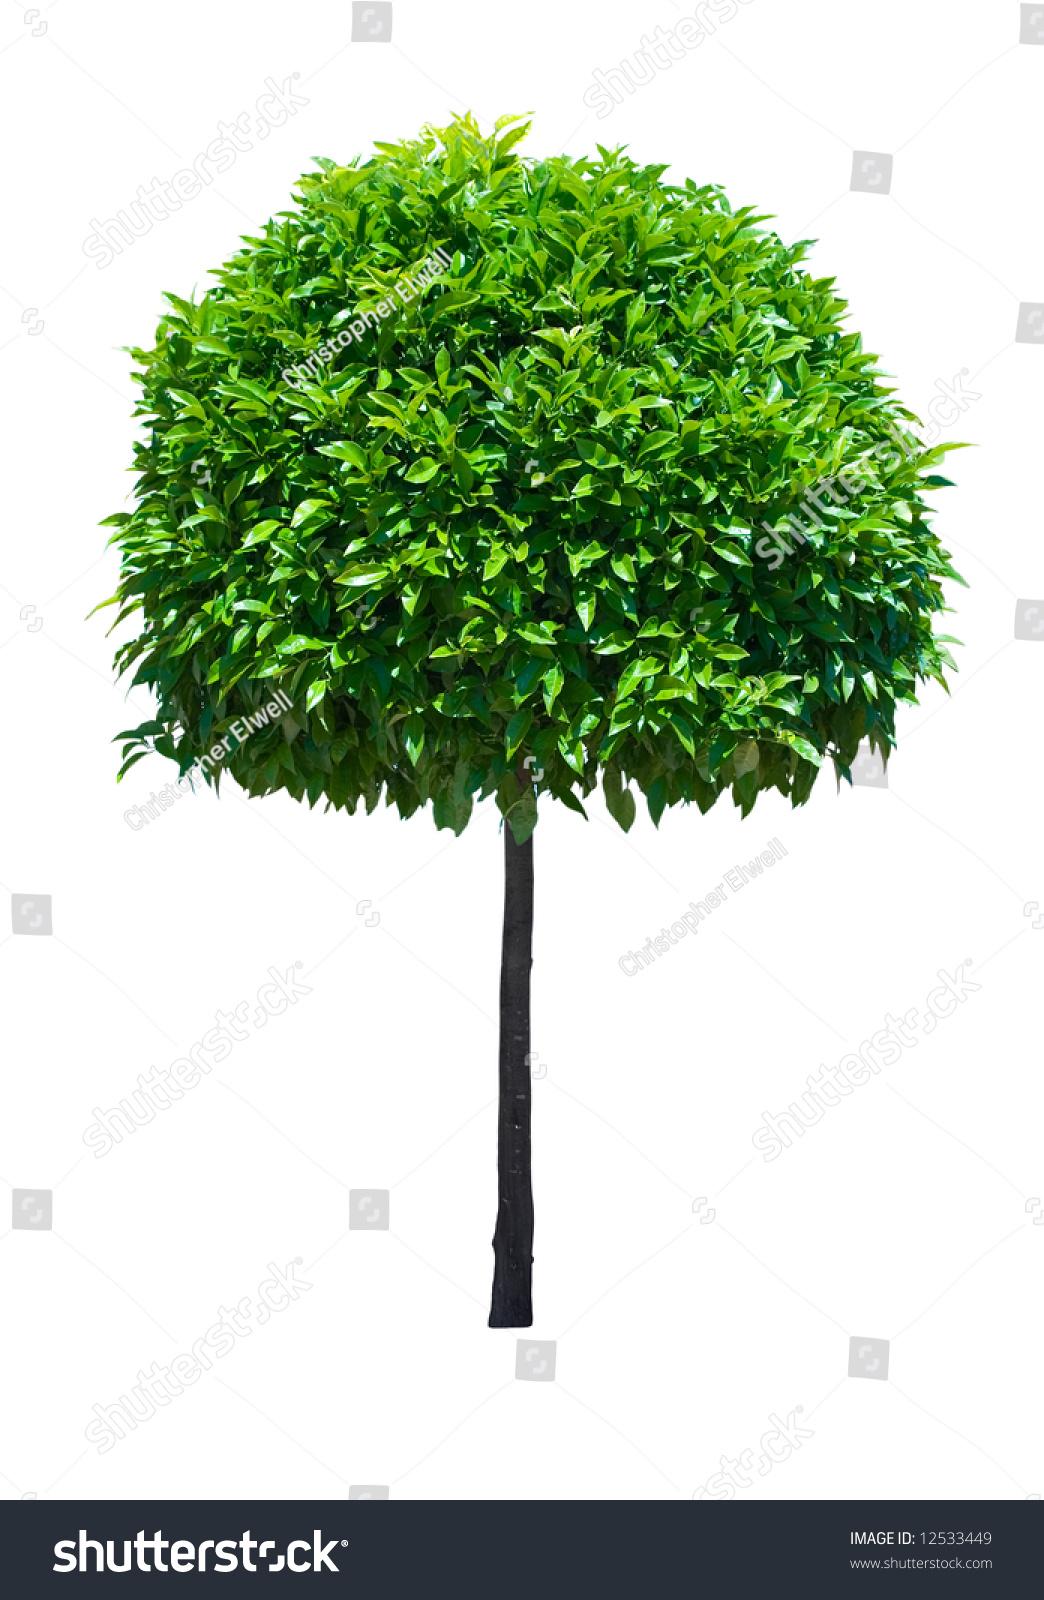 Ornamental evergreen trees - Ornamental Broad Leaf Evergreen Tree Isolated On White Background